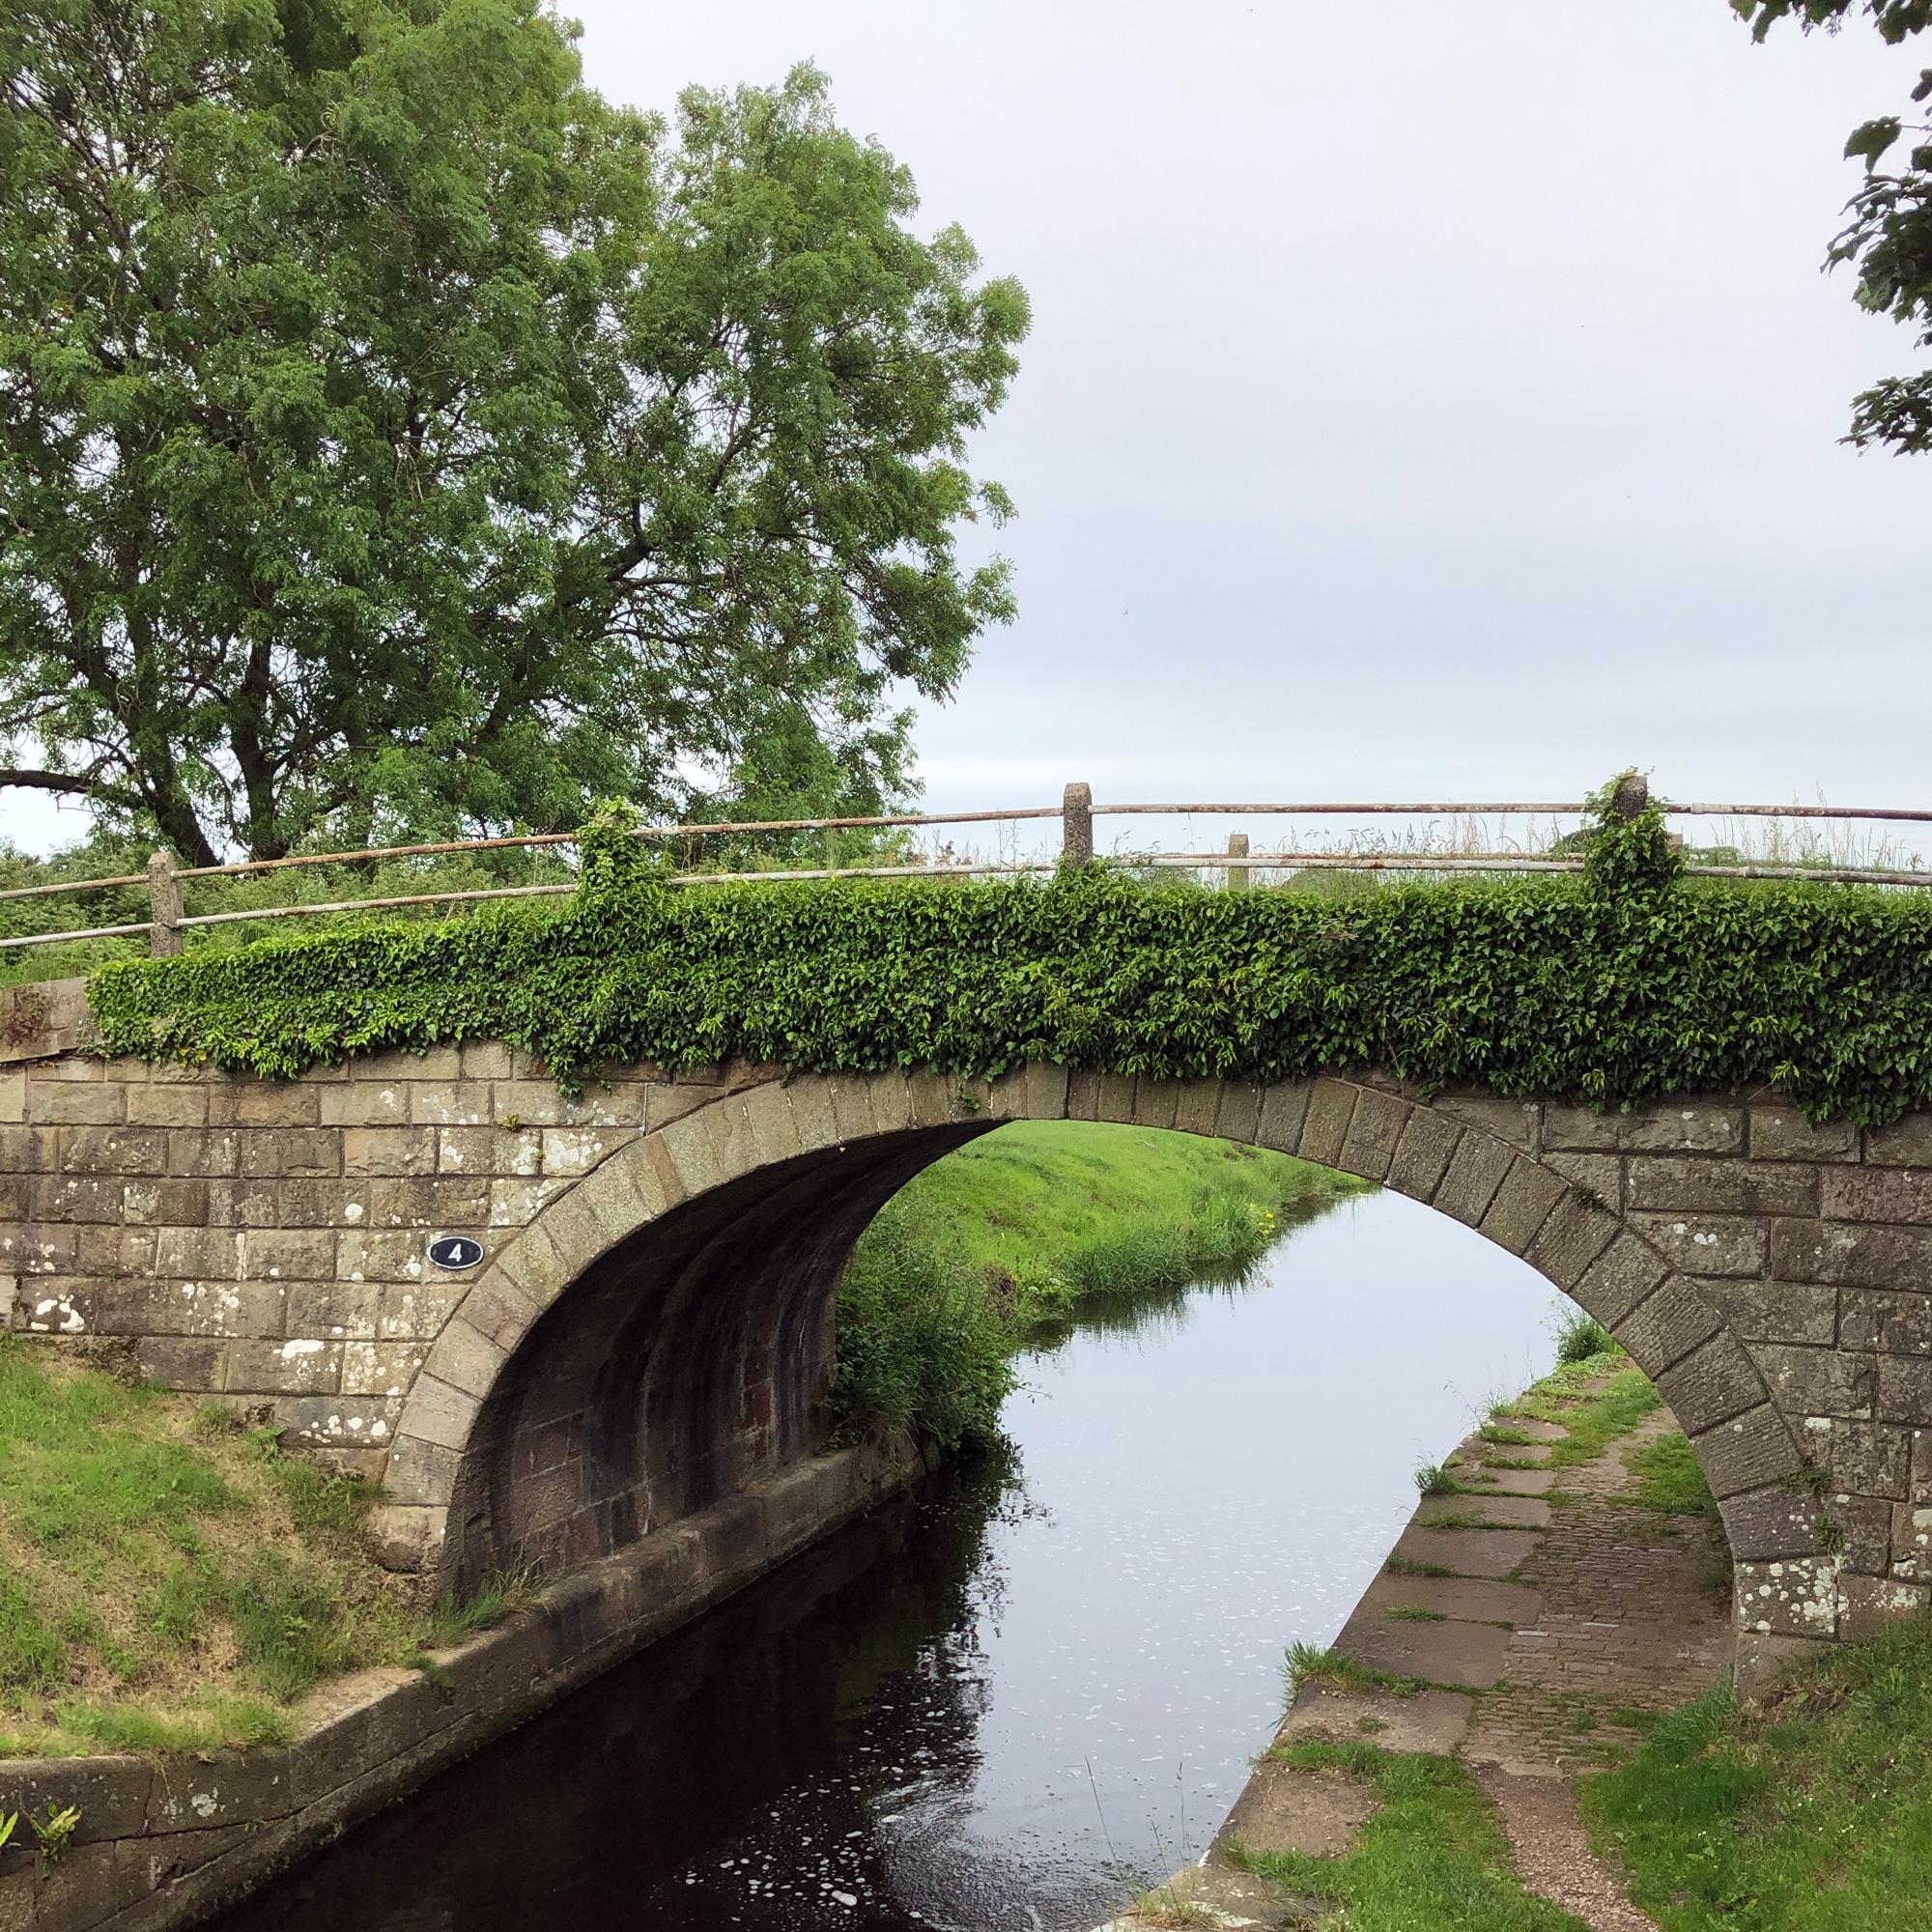 bridge-over-canal.jpg